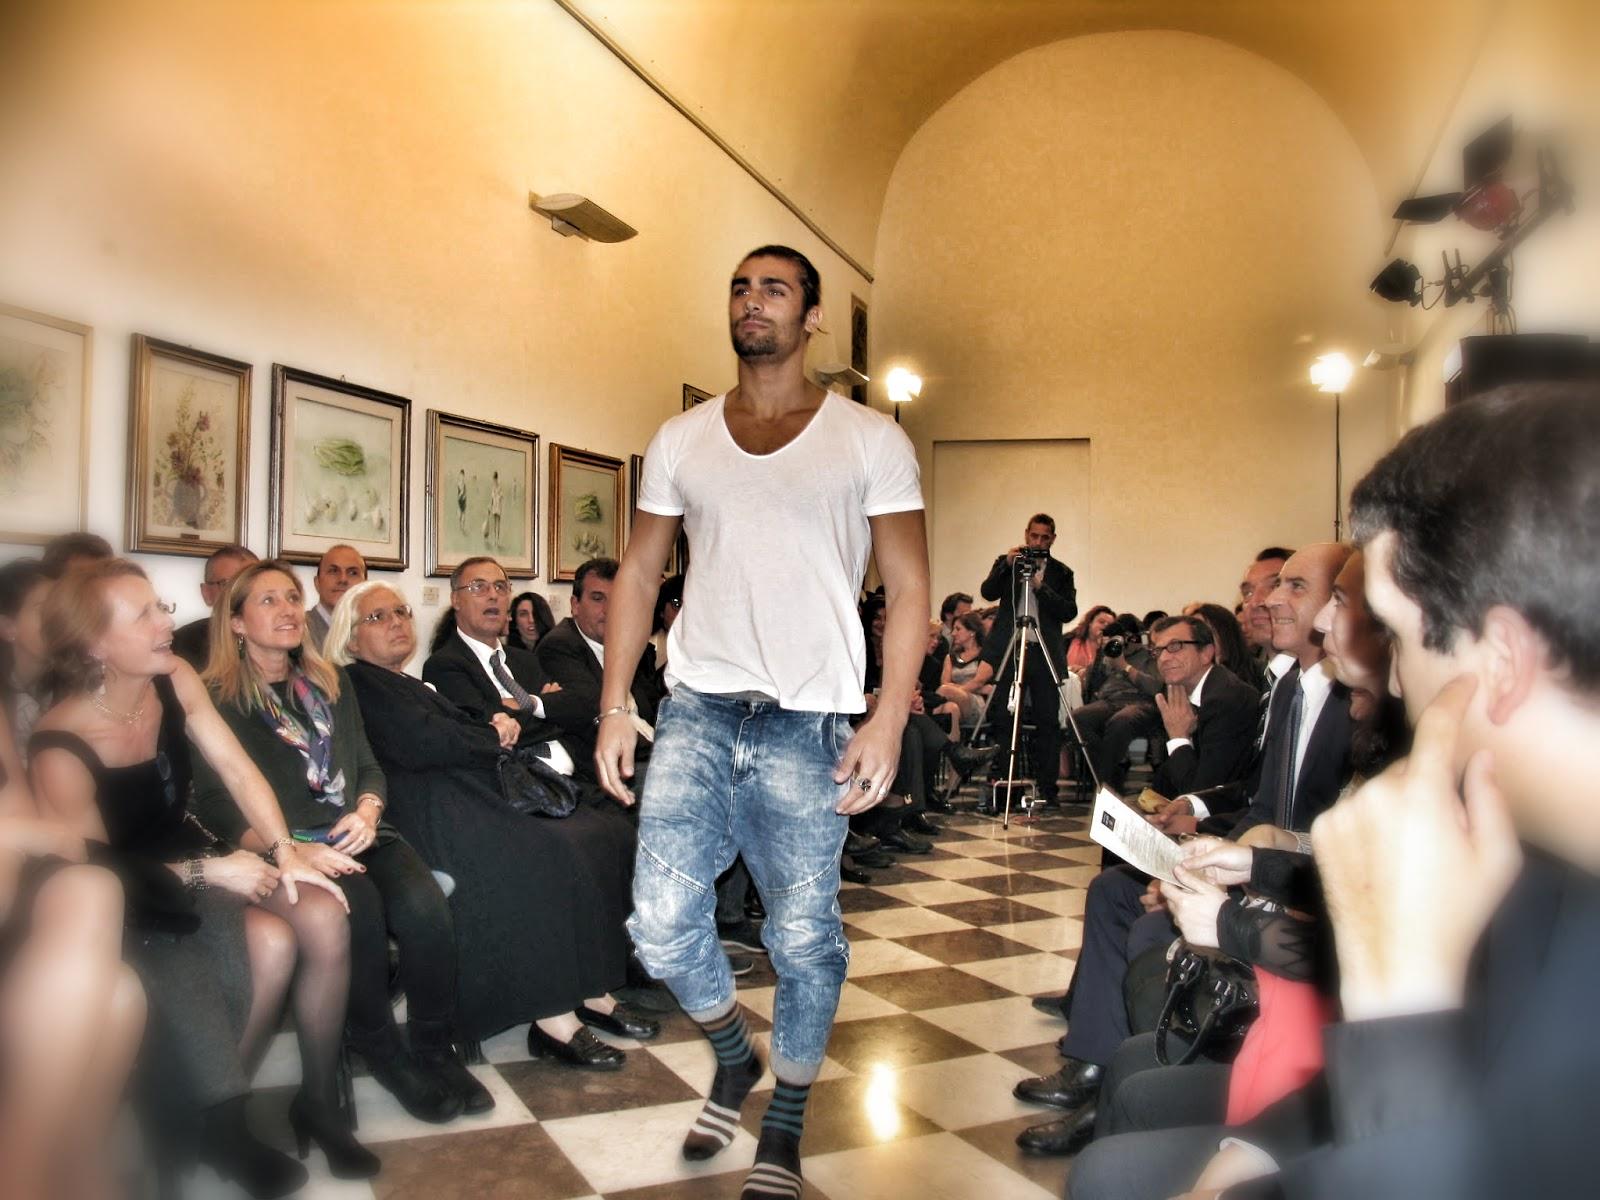 #grandefratello12, #lasciarpaviola, #sicilia